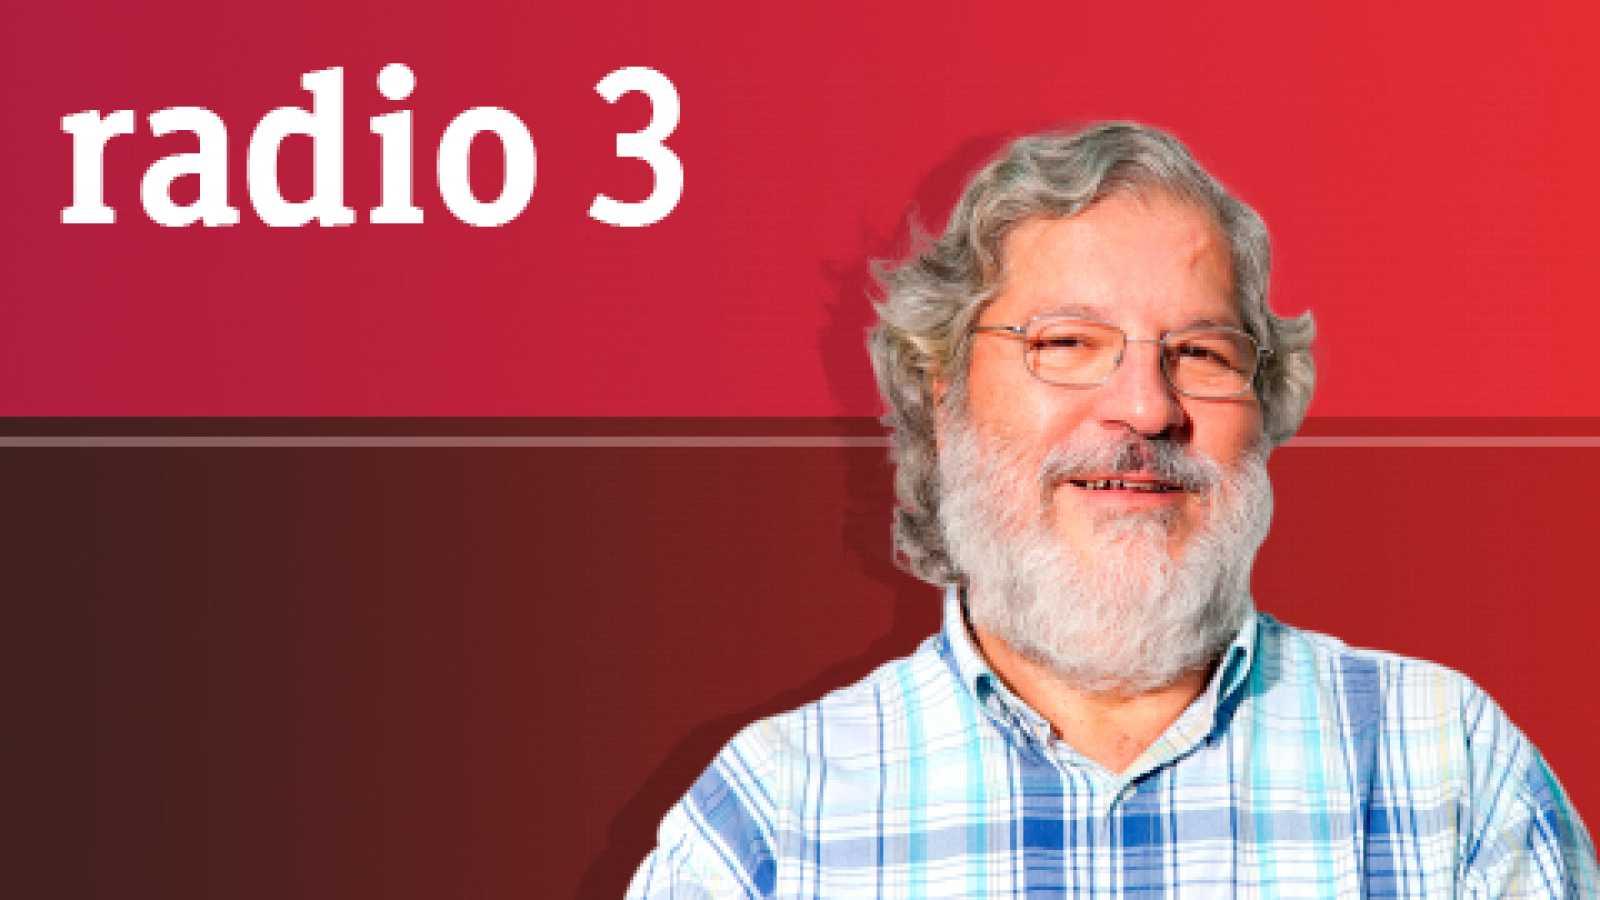 Discópolis 11.147 - Eduardo Paniagua, Orquesta de las Nubes - 25/11/20 - escuchar ahora